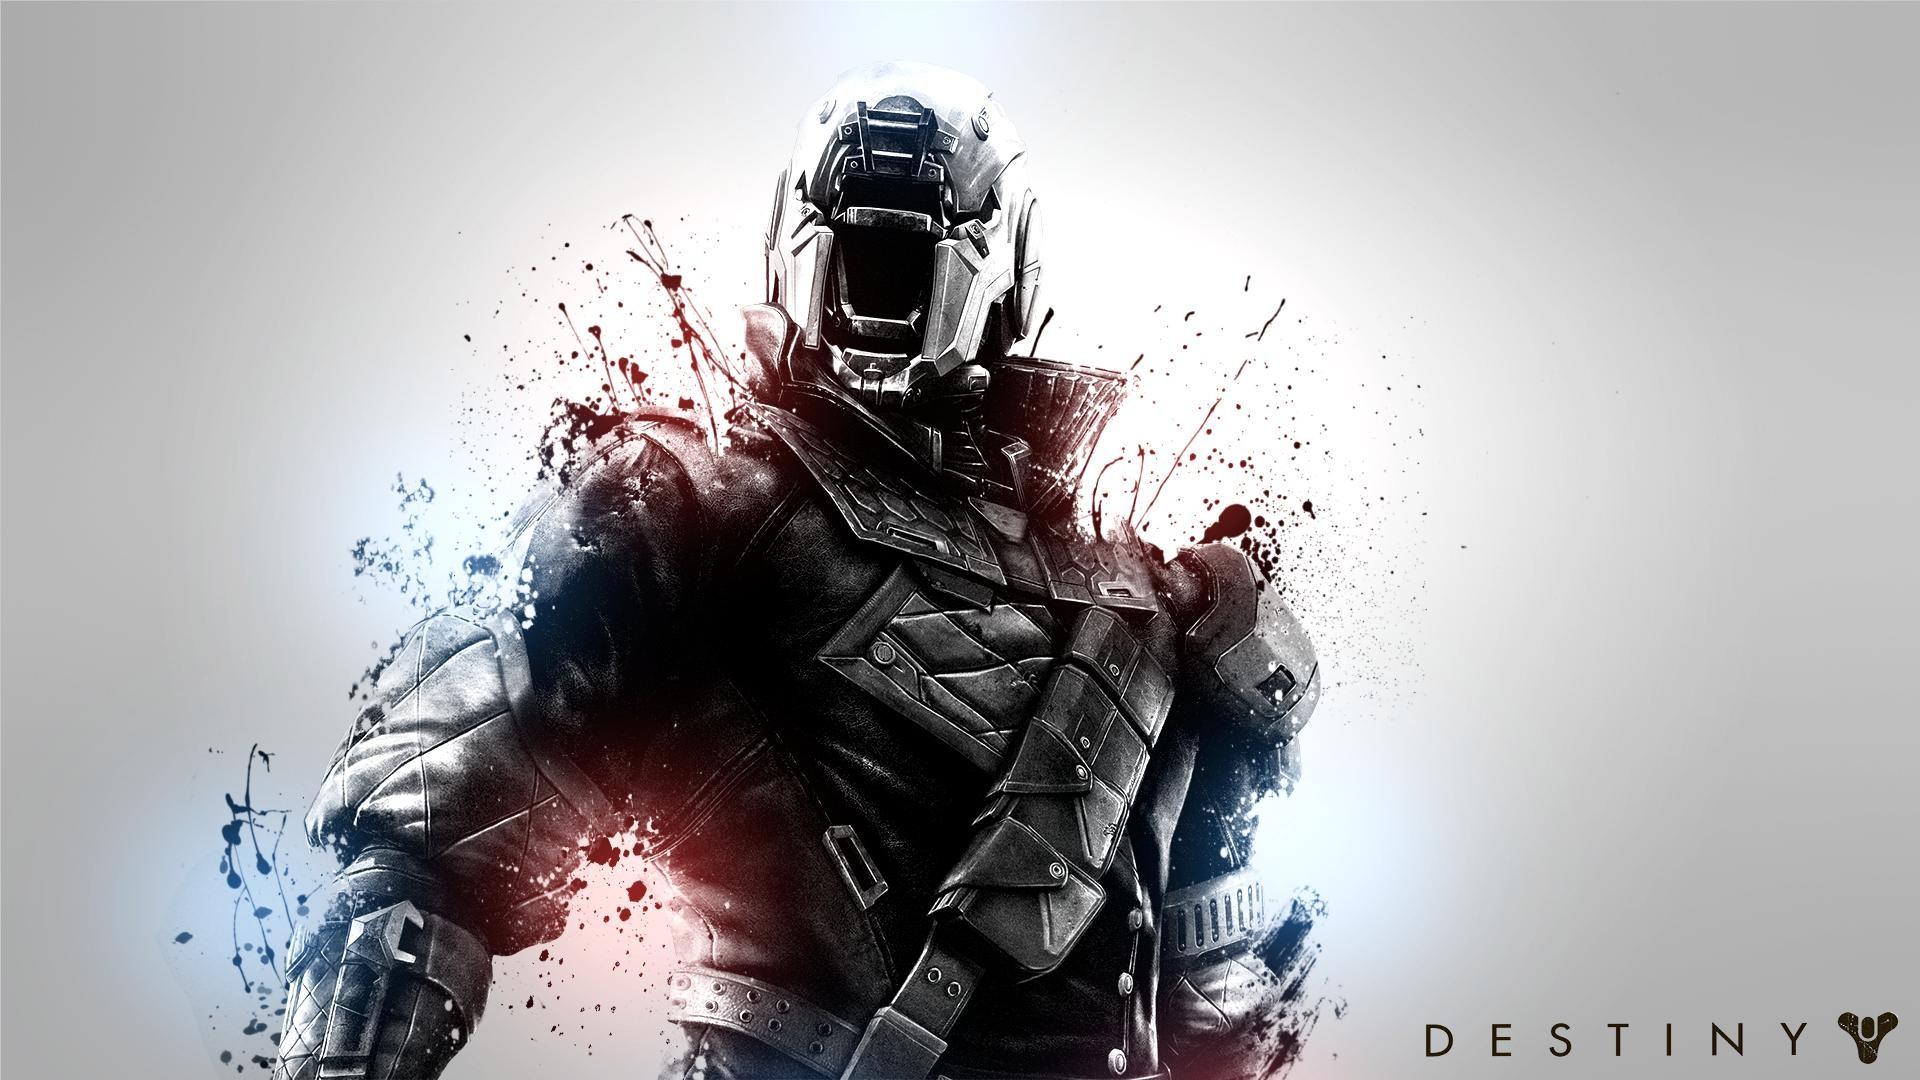 destiny game 2014 4k ultra hd hd 337 destiny hd wallpapers backgrounds .